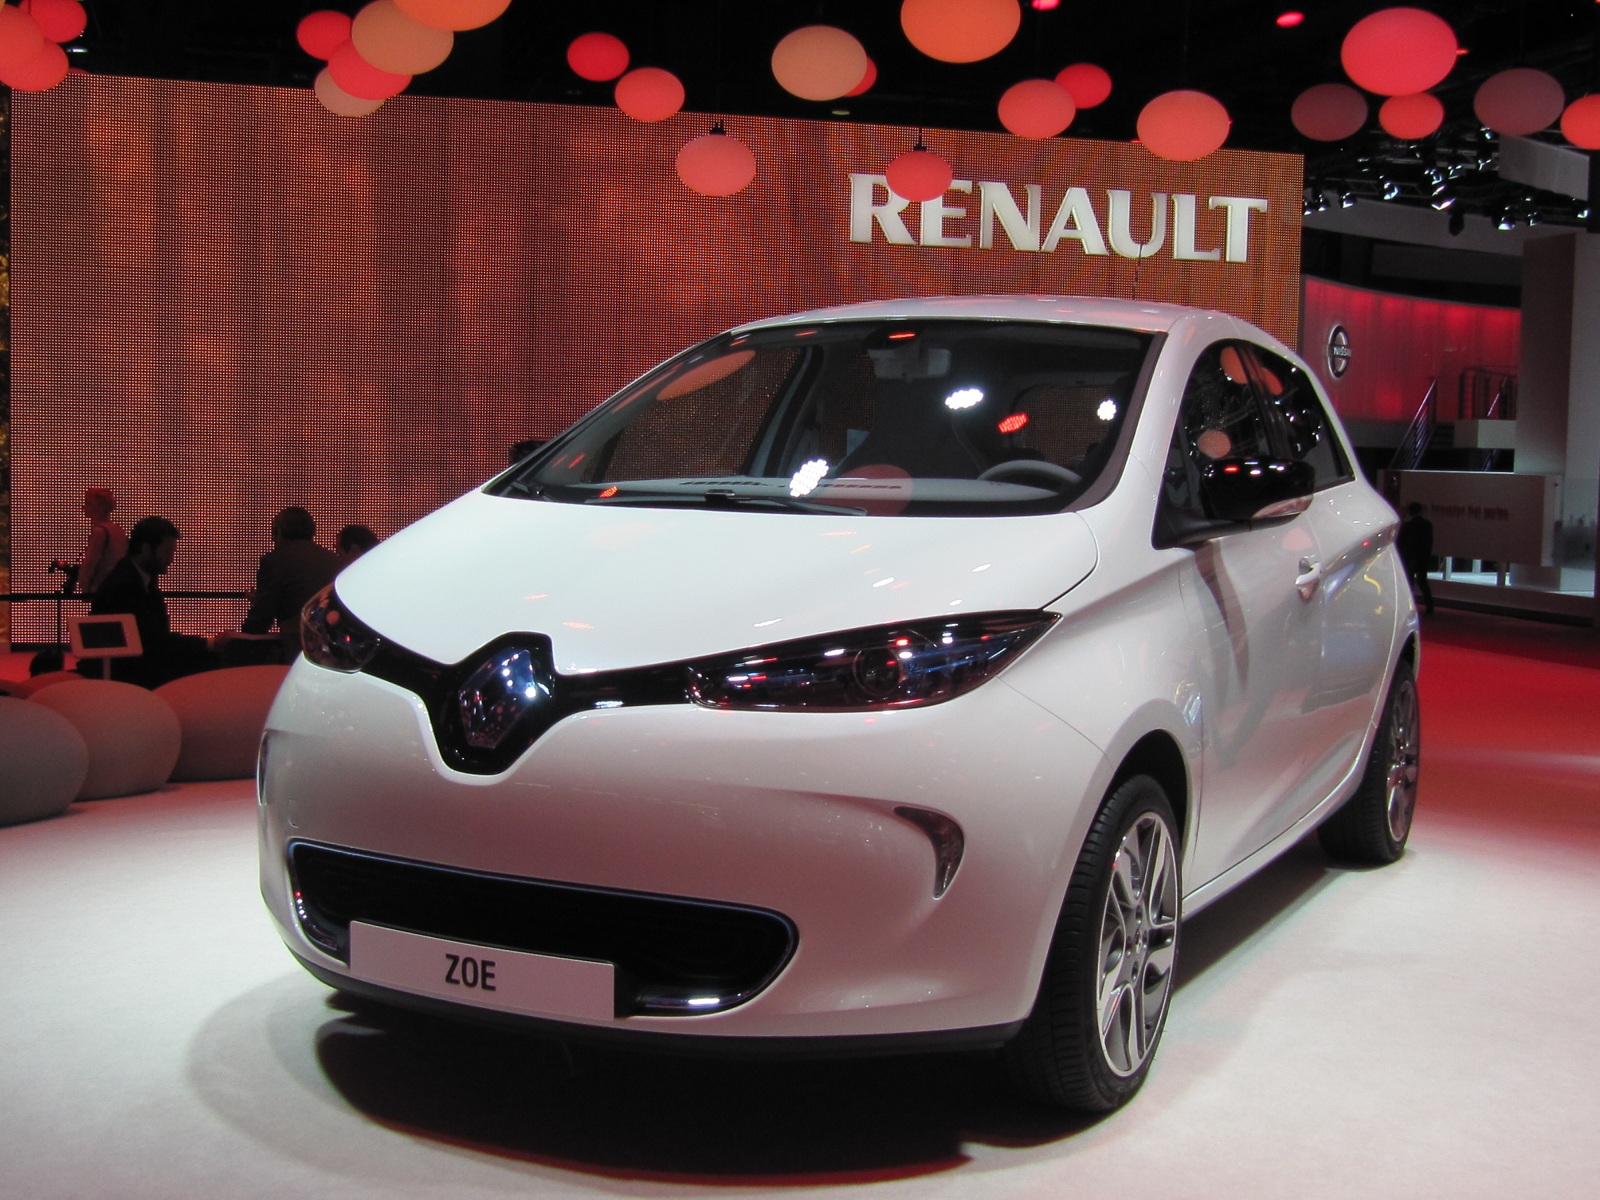 2013 Renault Zoe Electric Car: Paris Auto Show Live Photos